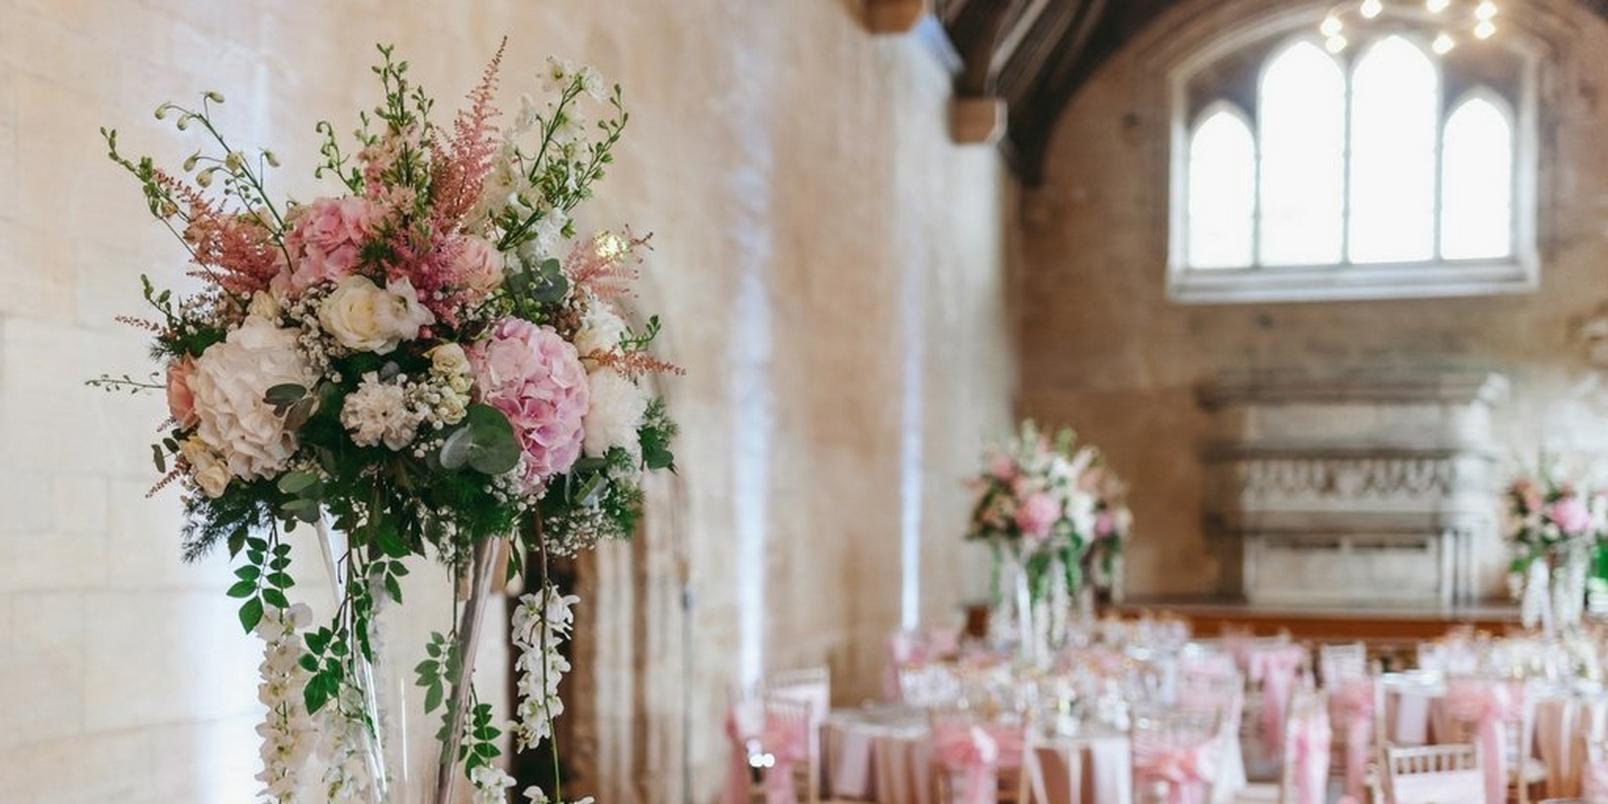 award-winning-wedding-florist-wales-2